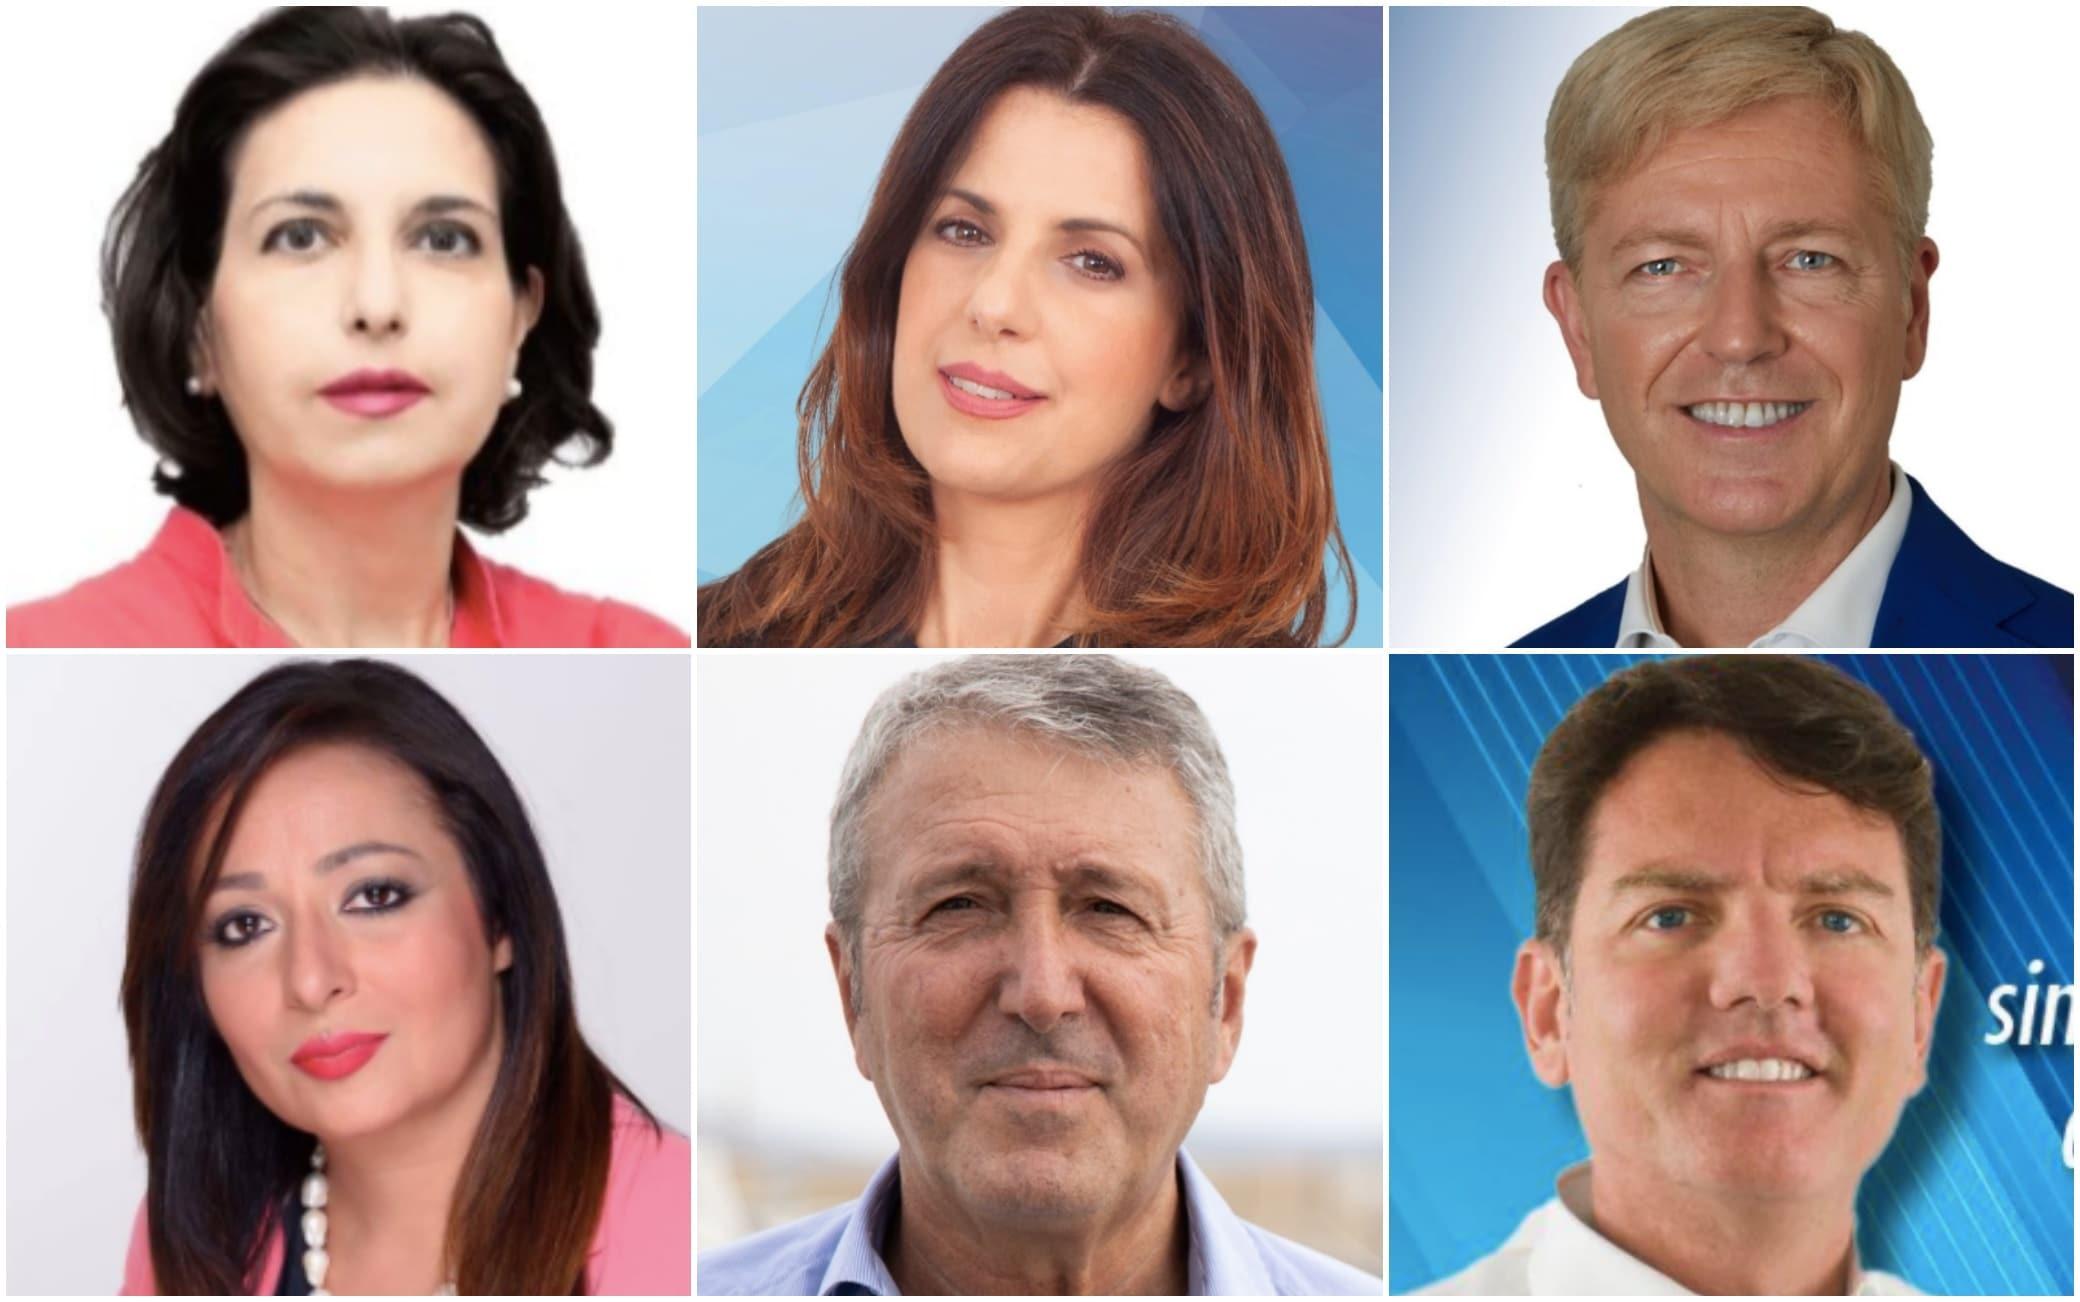 candidati sindaco agrigento 2020